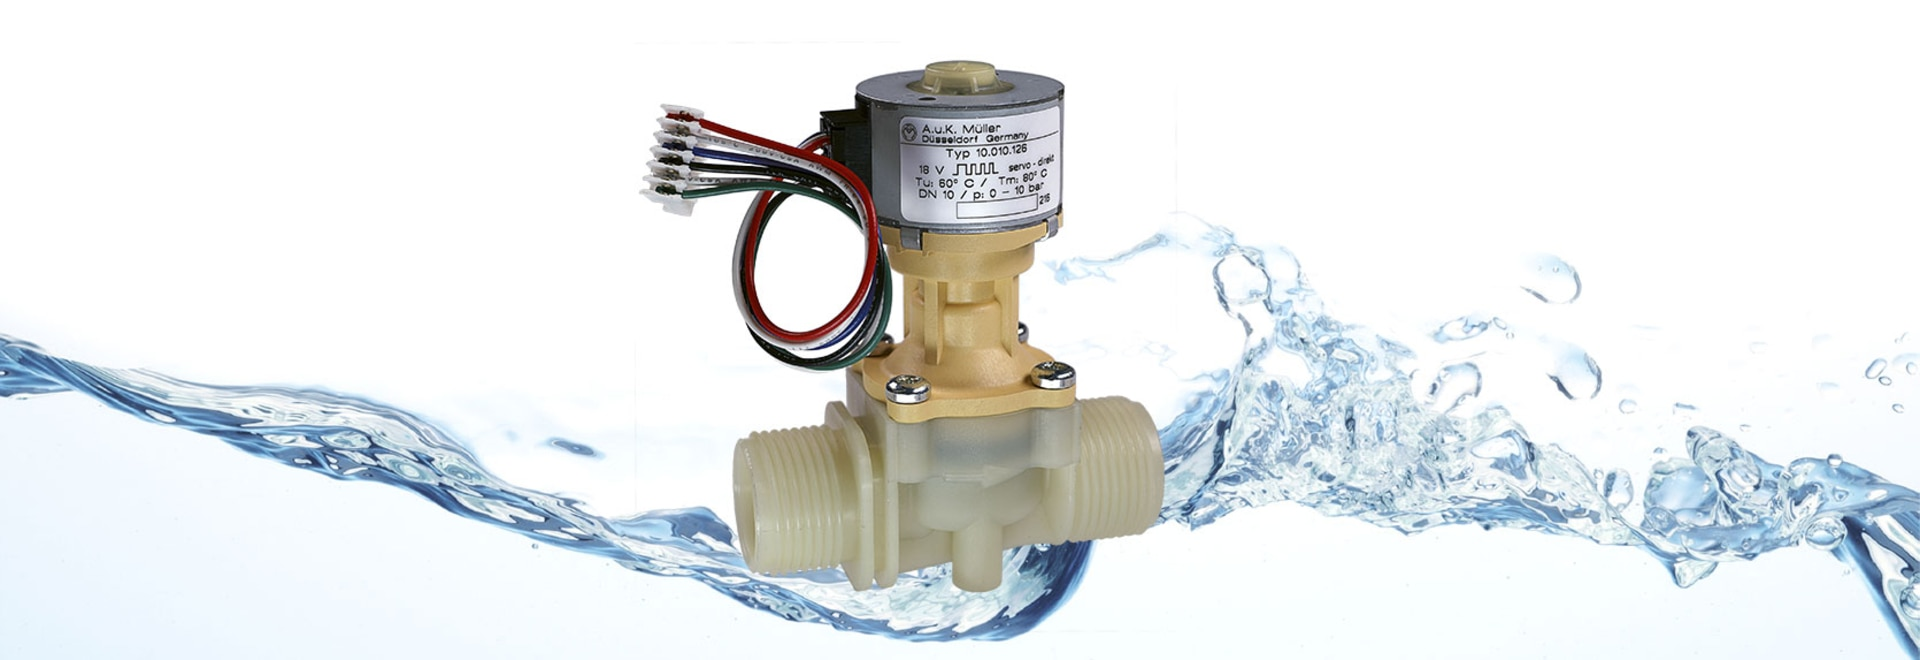 Servo-direct stepper motor controlled valve DN 10